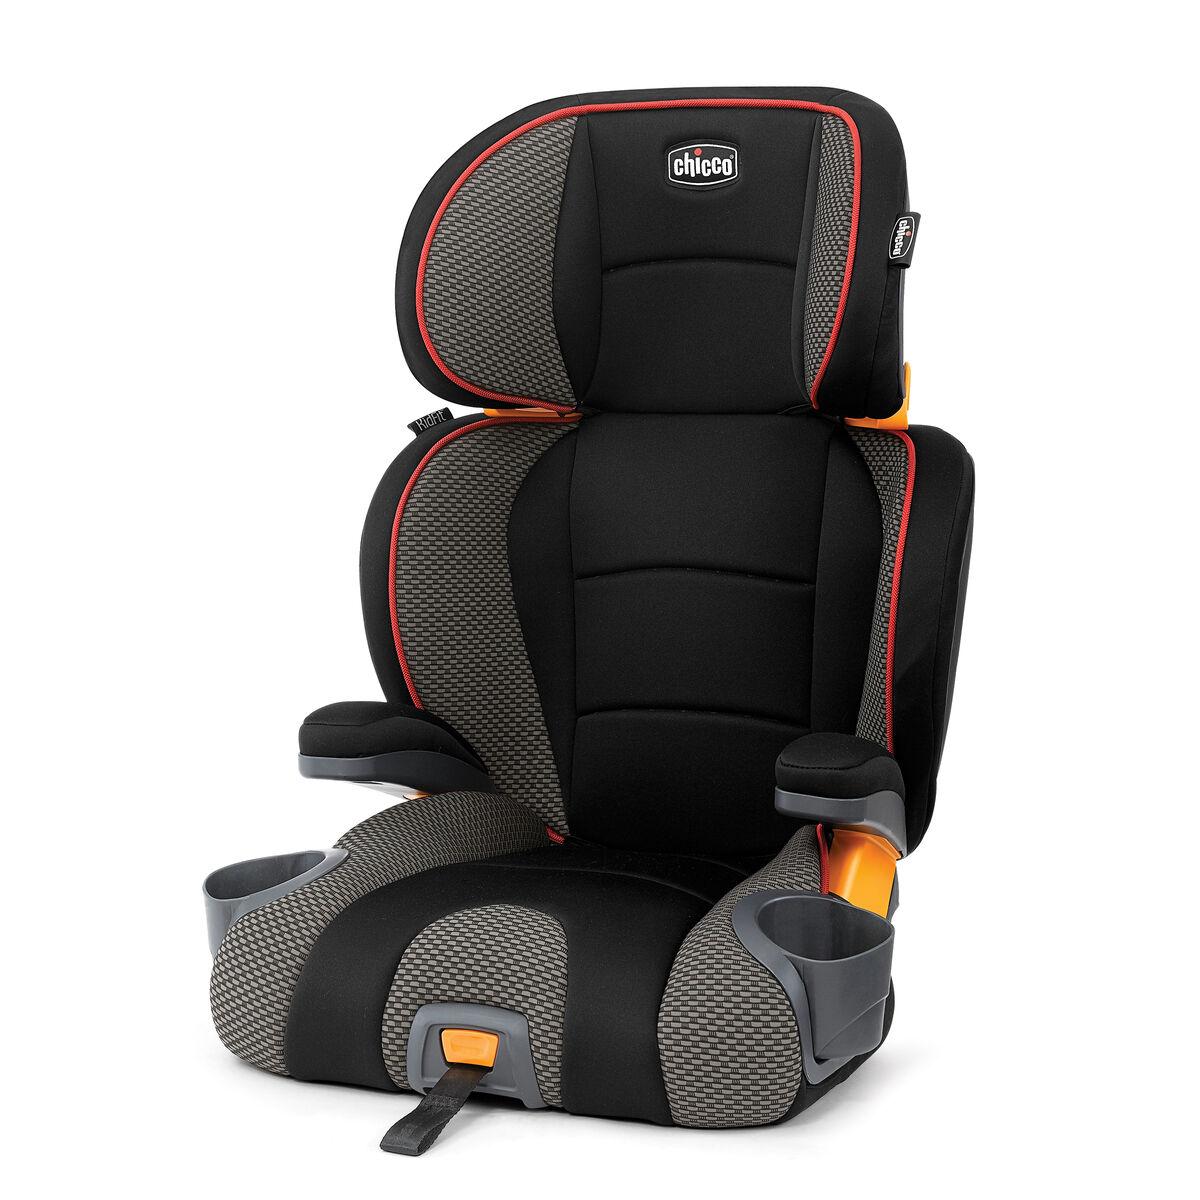 Chicco Car Seat Orange